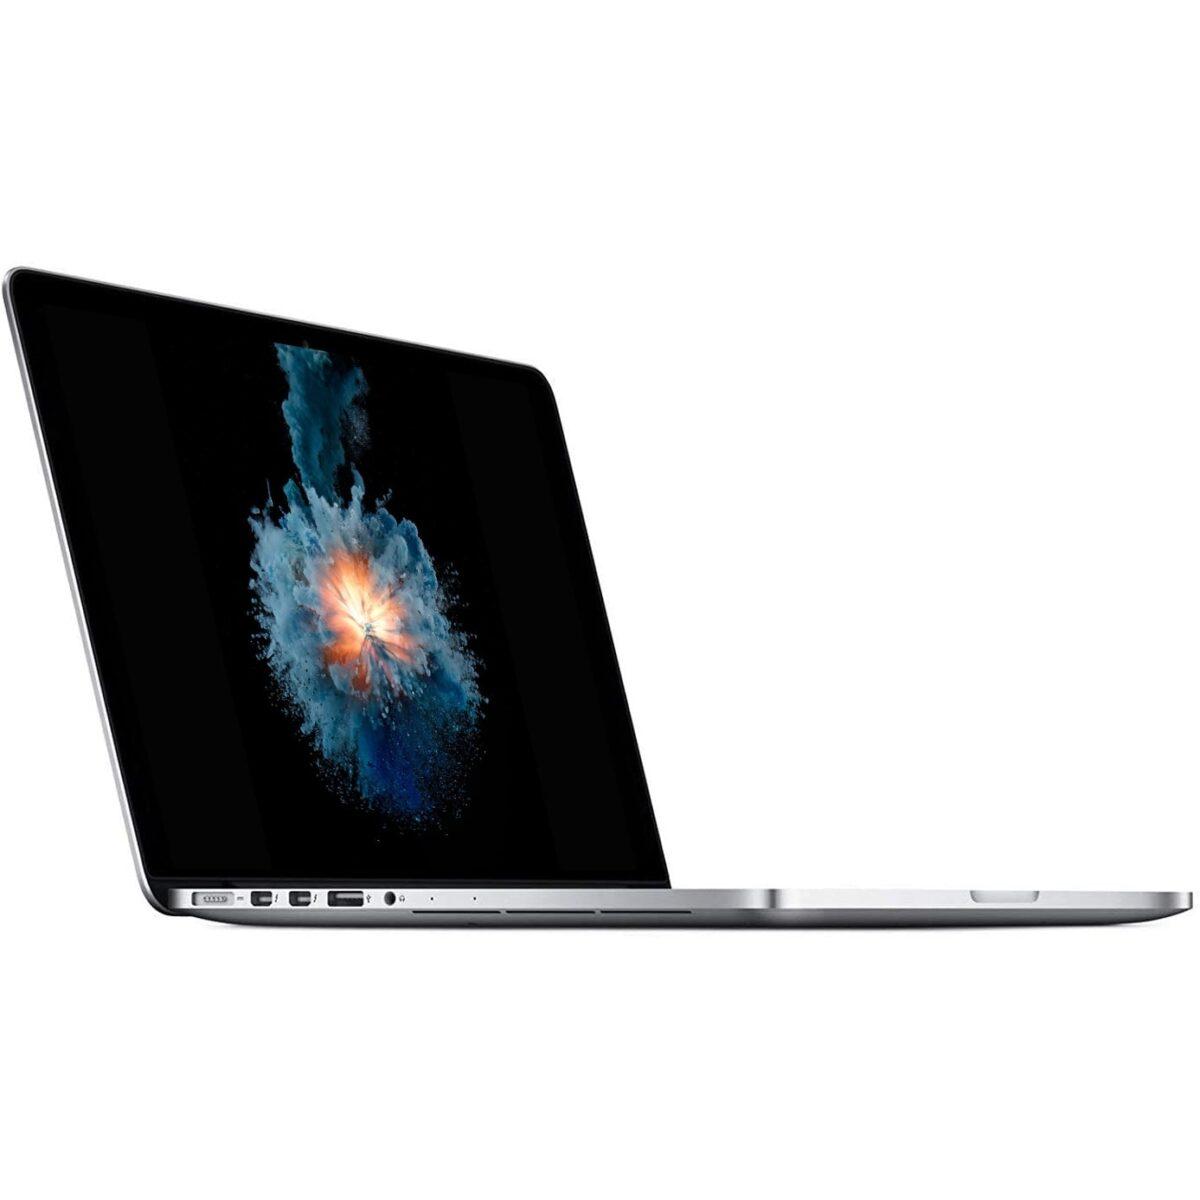 "Retina Apple Macbook Pro 13.3"" Core i7 3.10GHZ Powerful 256GB SSD 8GB RAM A1502 Mac Laptop OS Catalina"